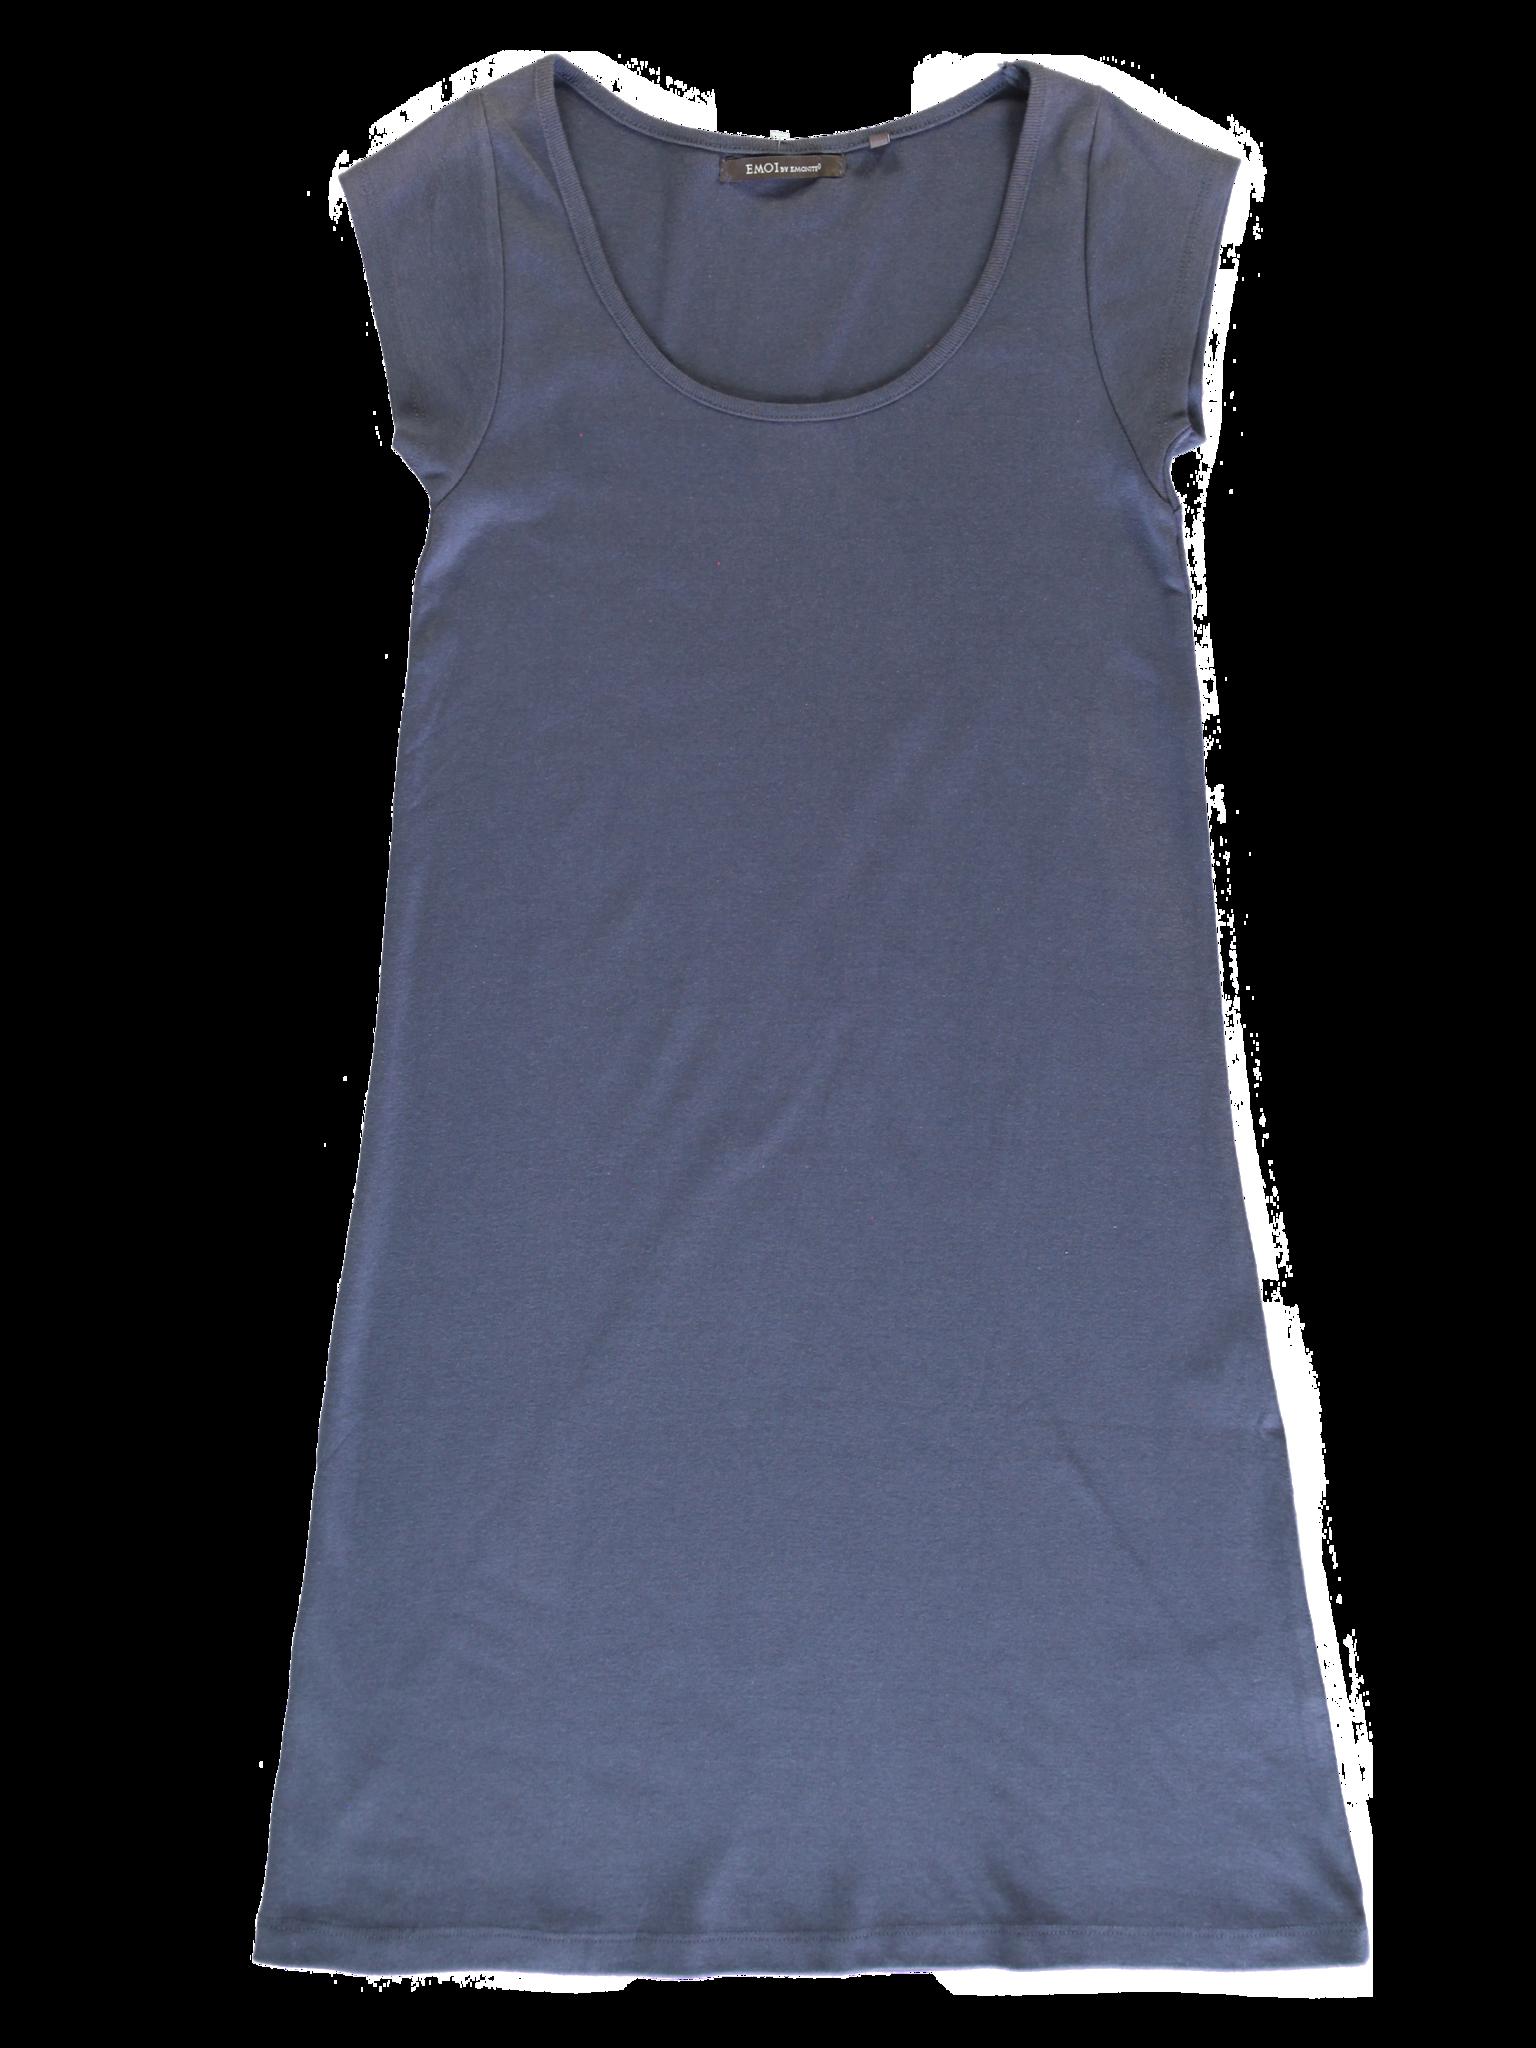 All Brands | Summerproducts Ladies | Dress | 24 pcs/box